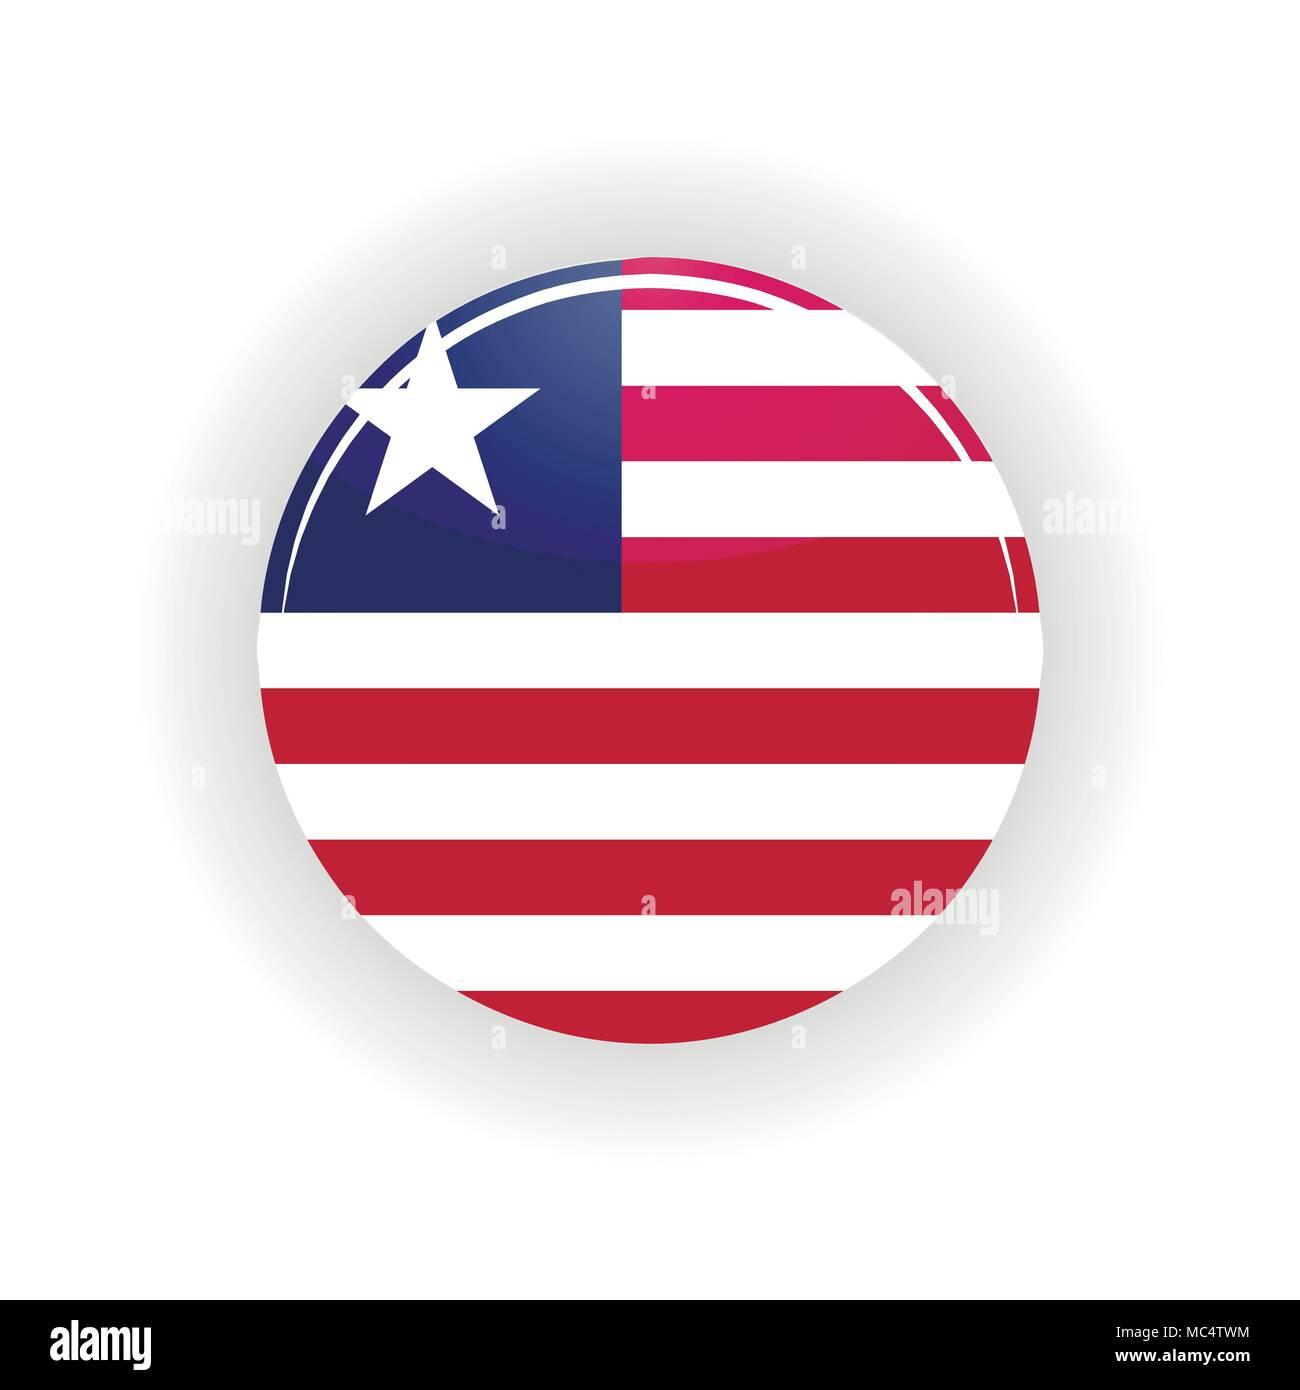 Liberia icon circle - Stock Image